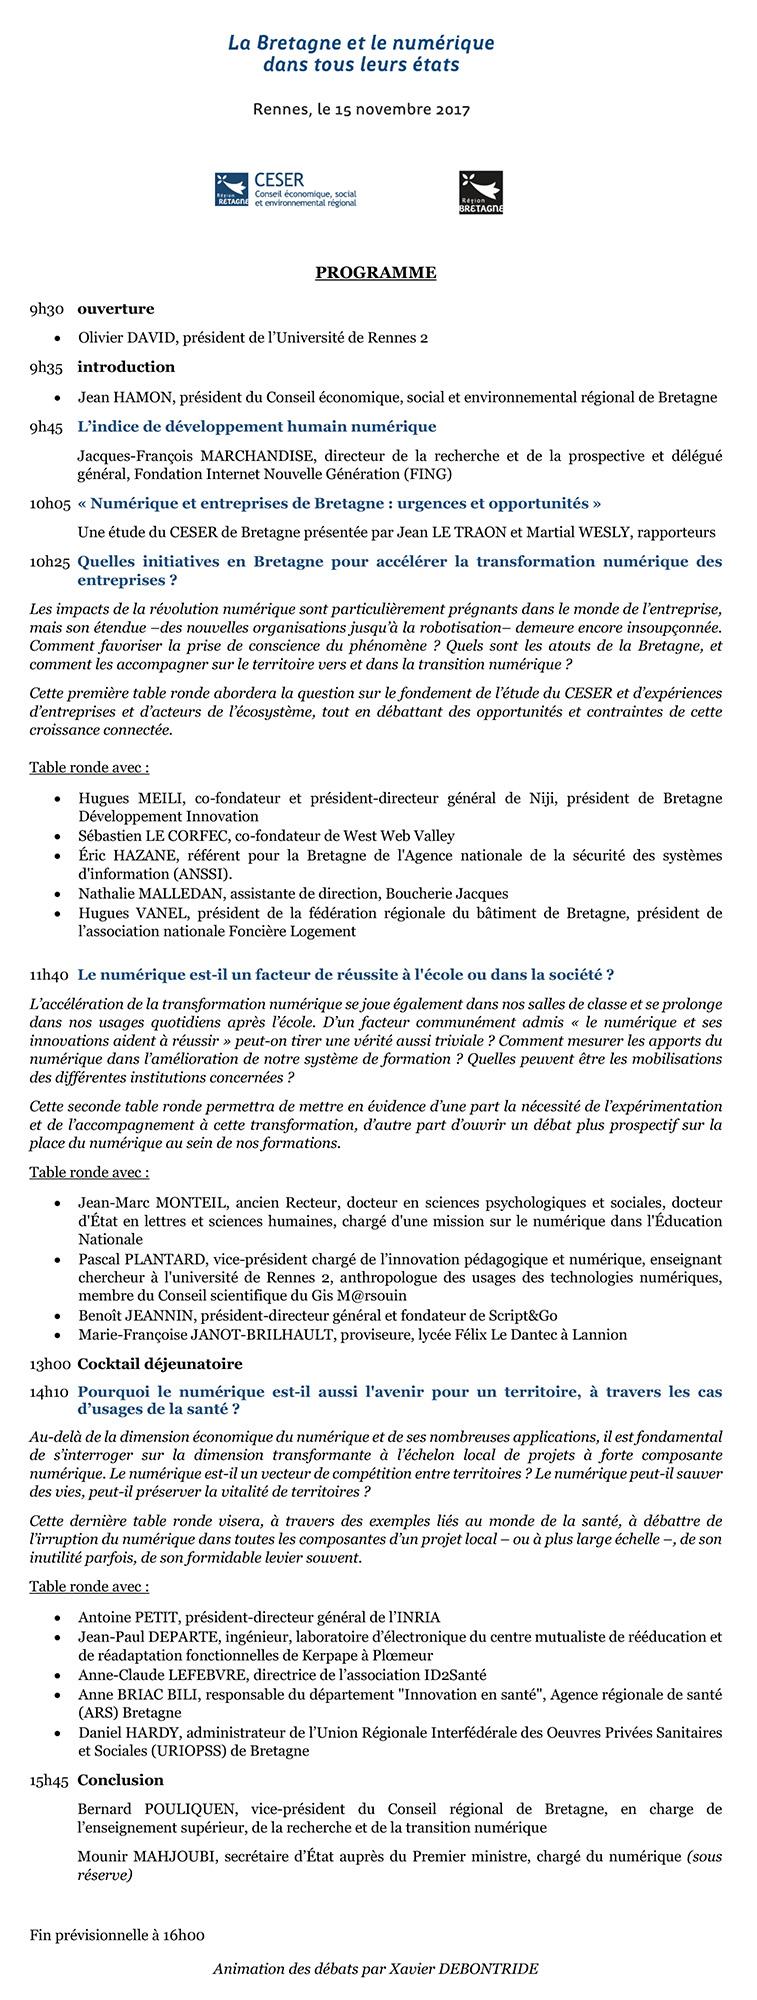 programme au 30/10/2017